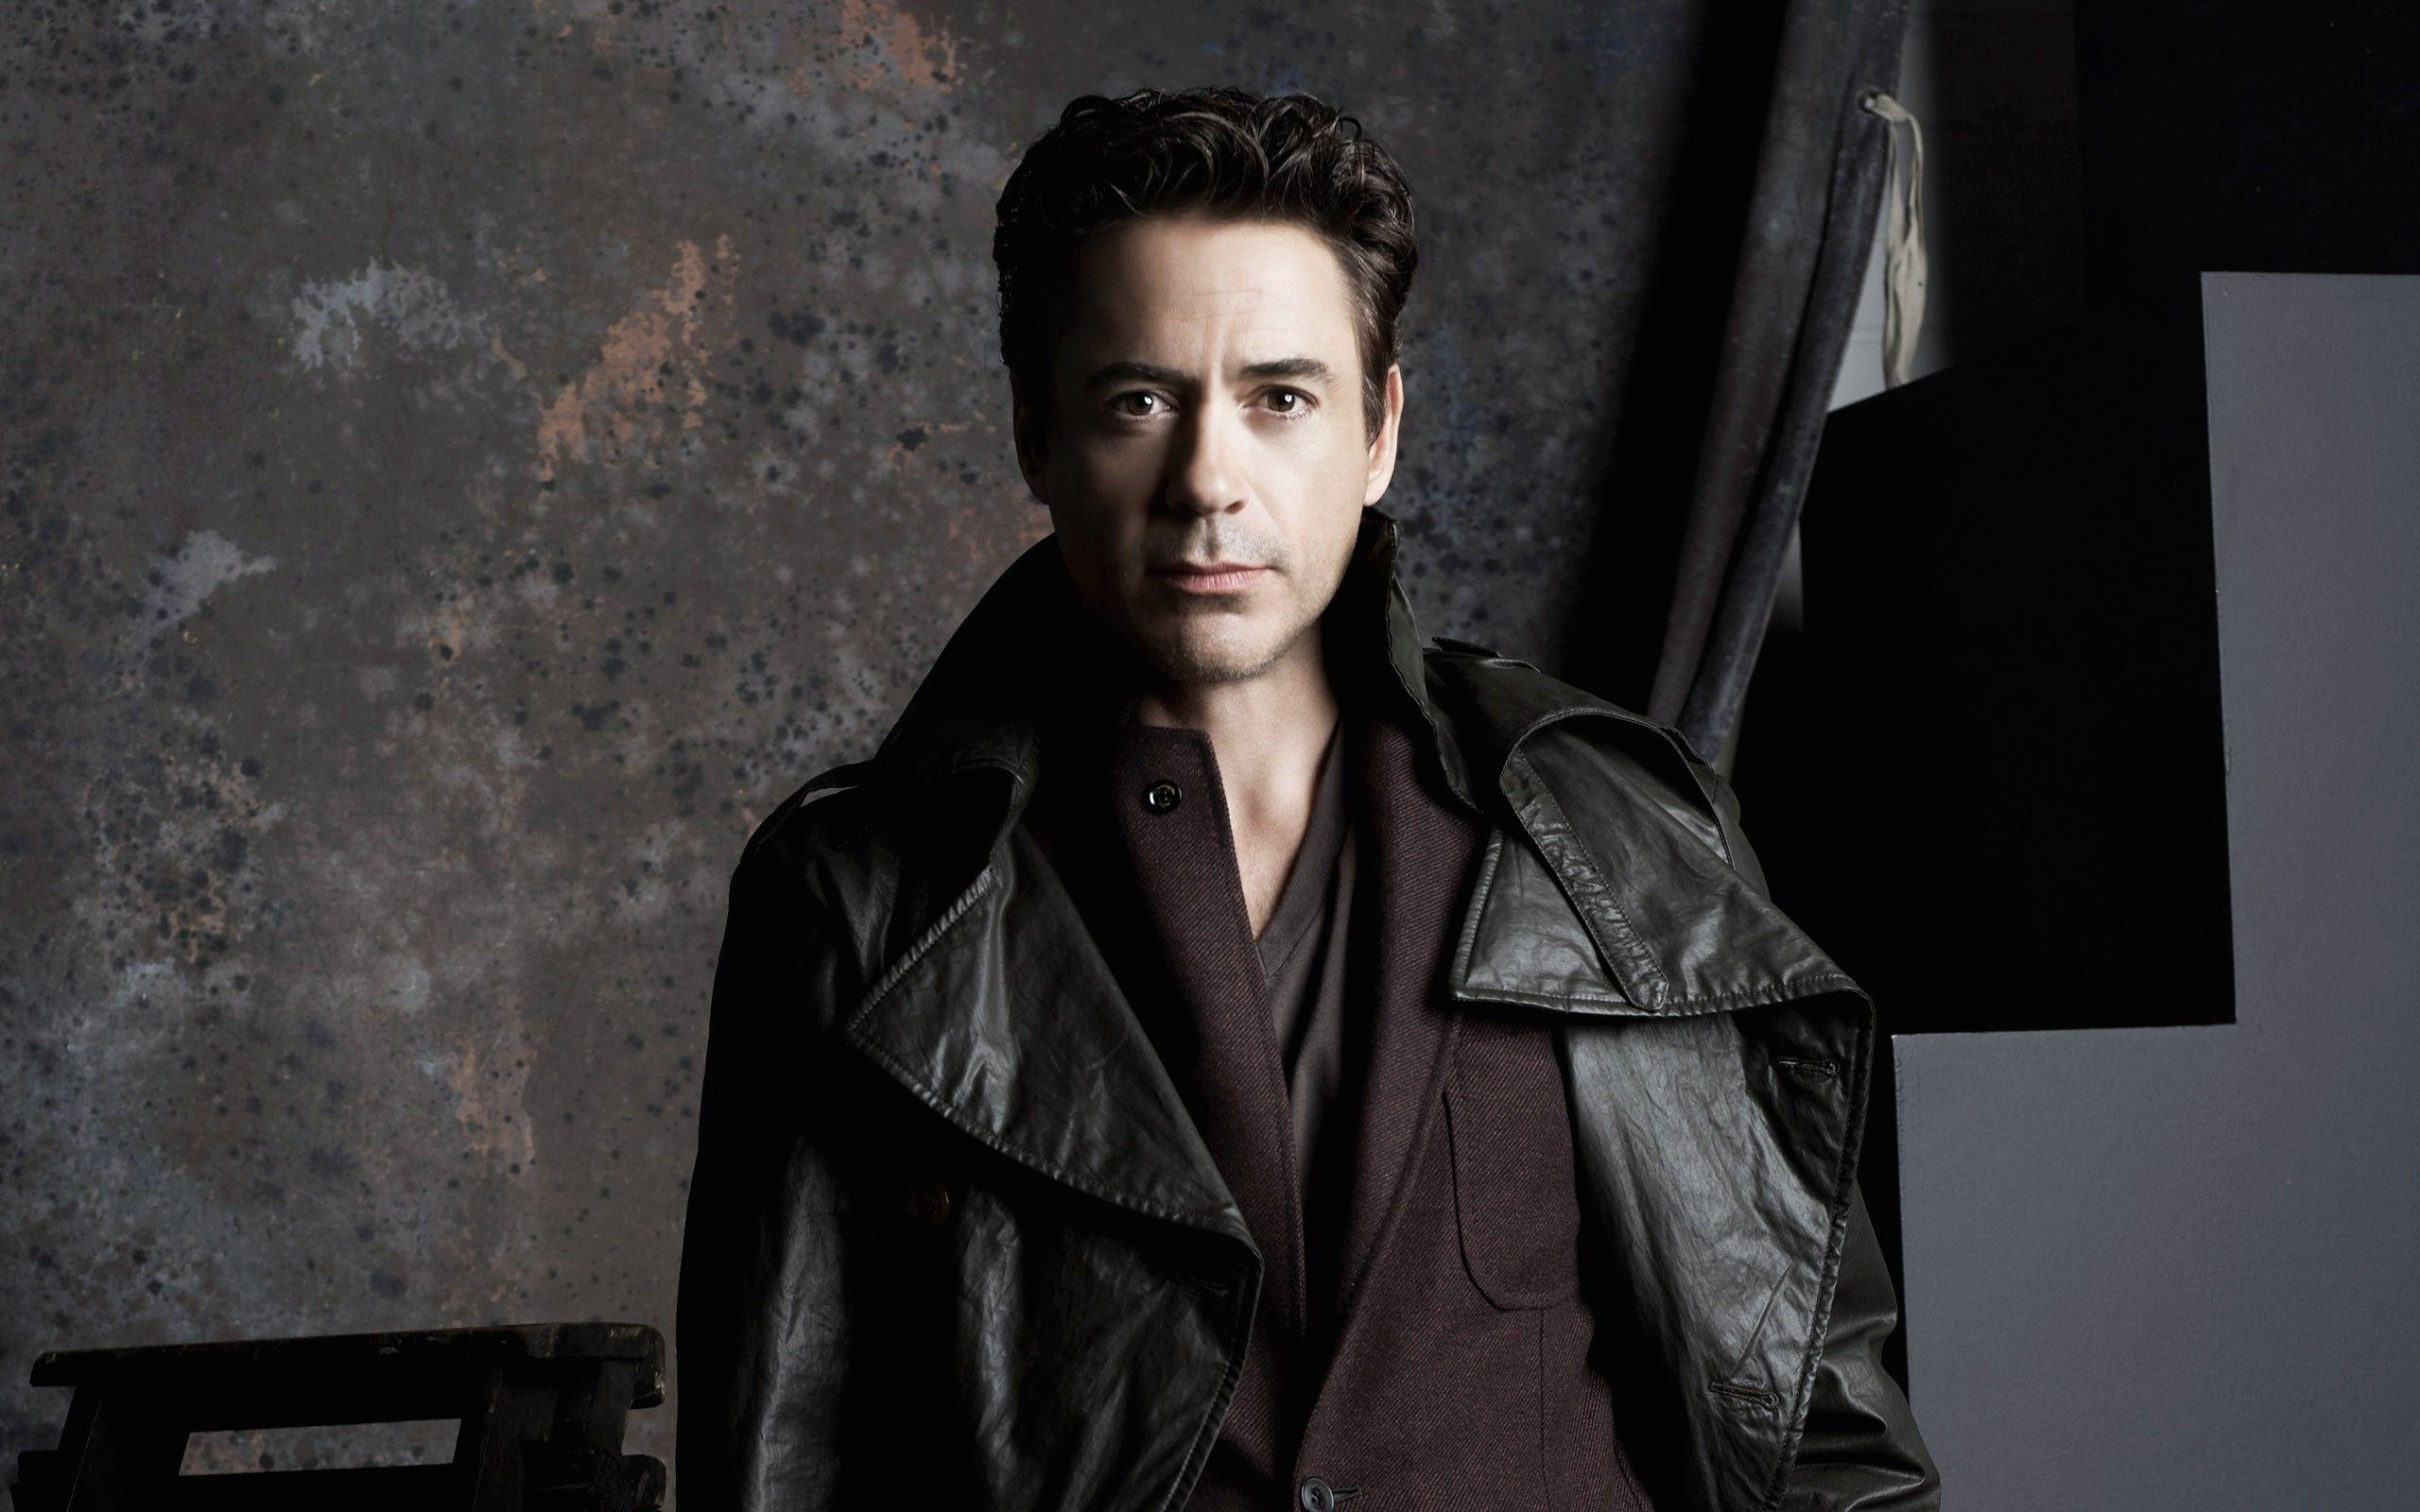 Robert Downey Jr Wallpapers - Full HD wallpaper search